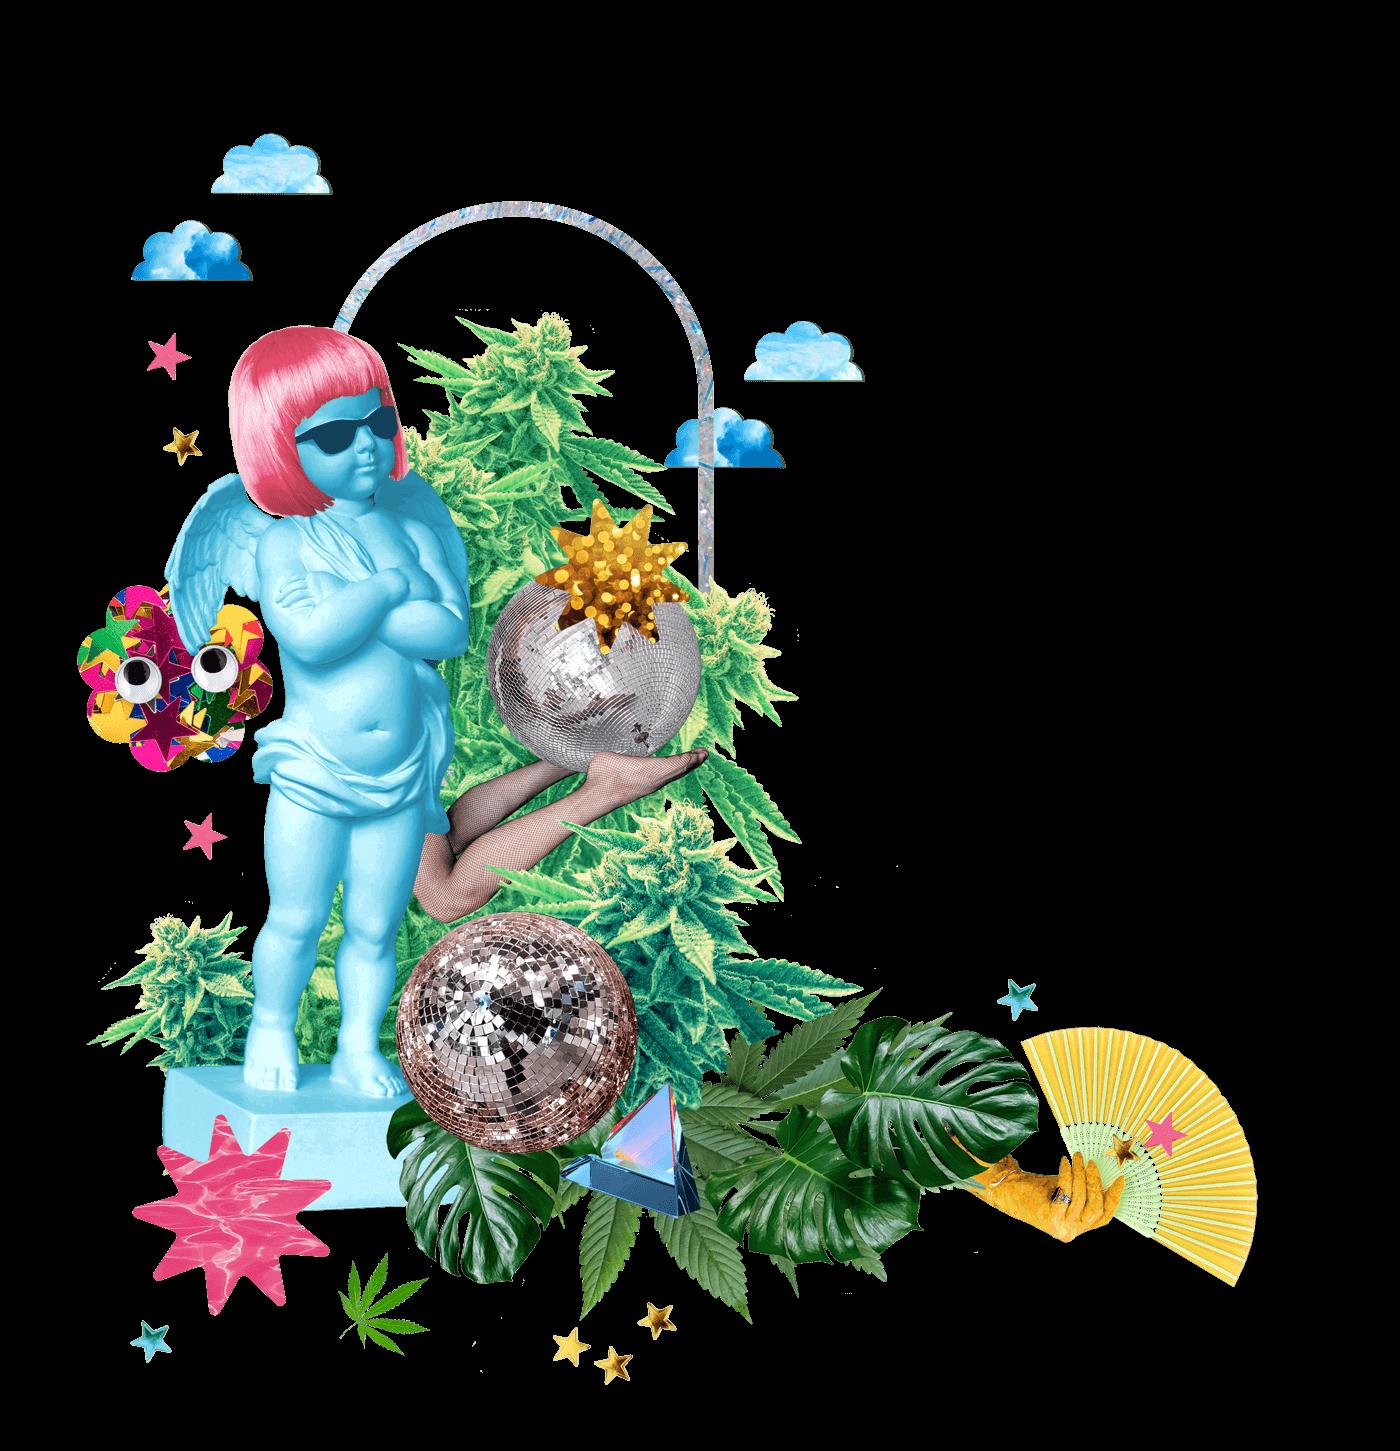 a fun collage of marijuana flowers